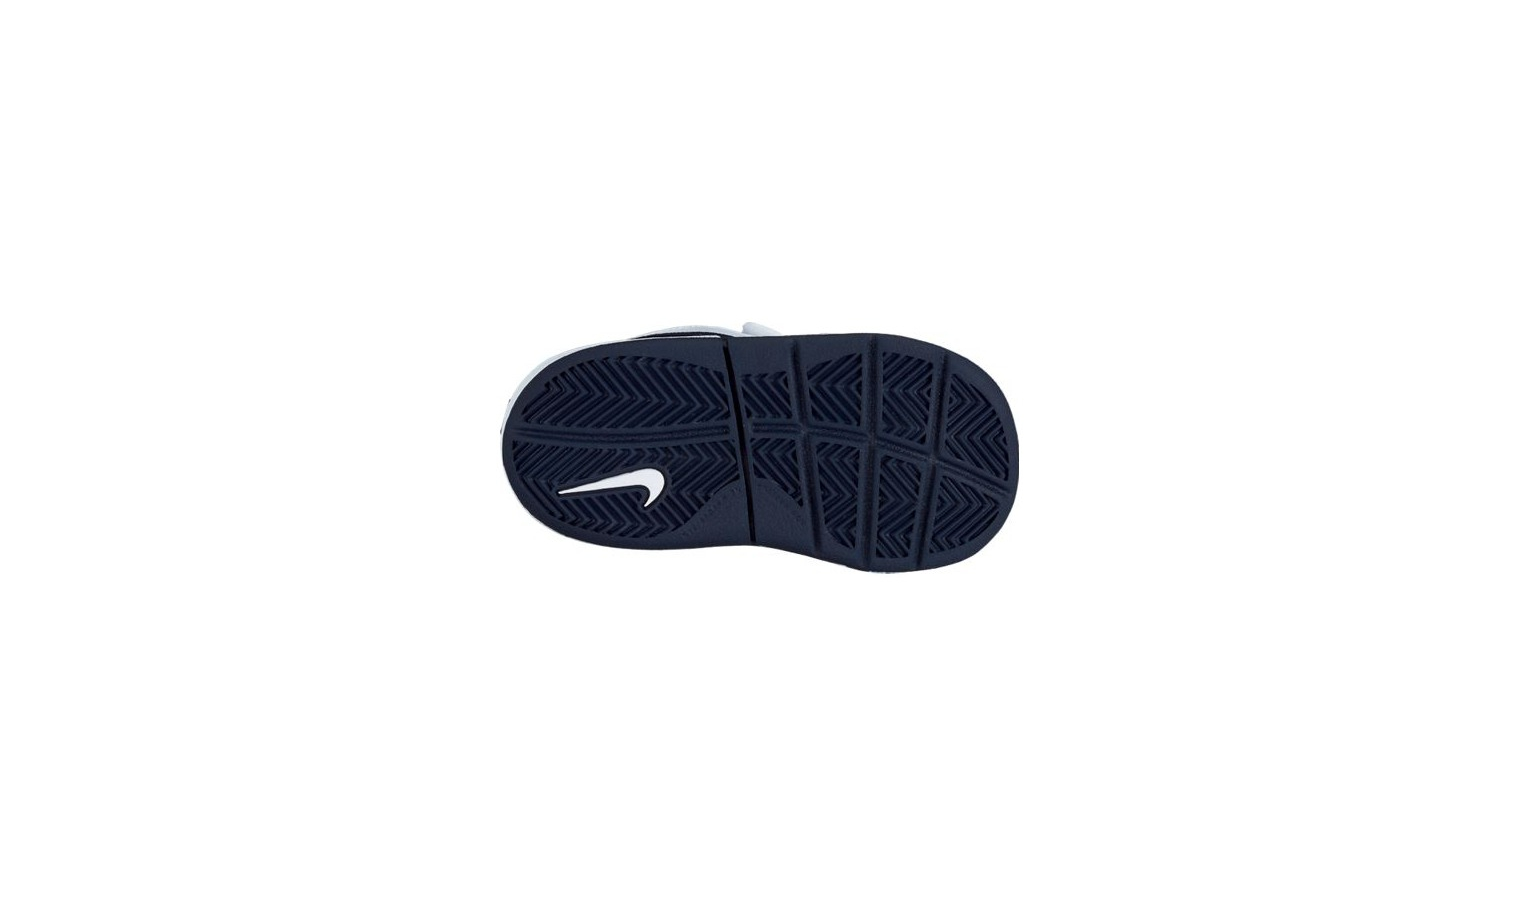 ... Dětské boty Nike PICO 4 bílé. Sleva 670fa70164